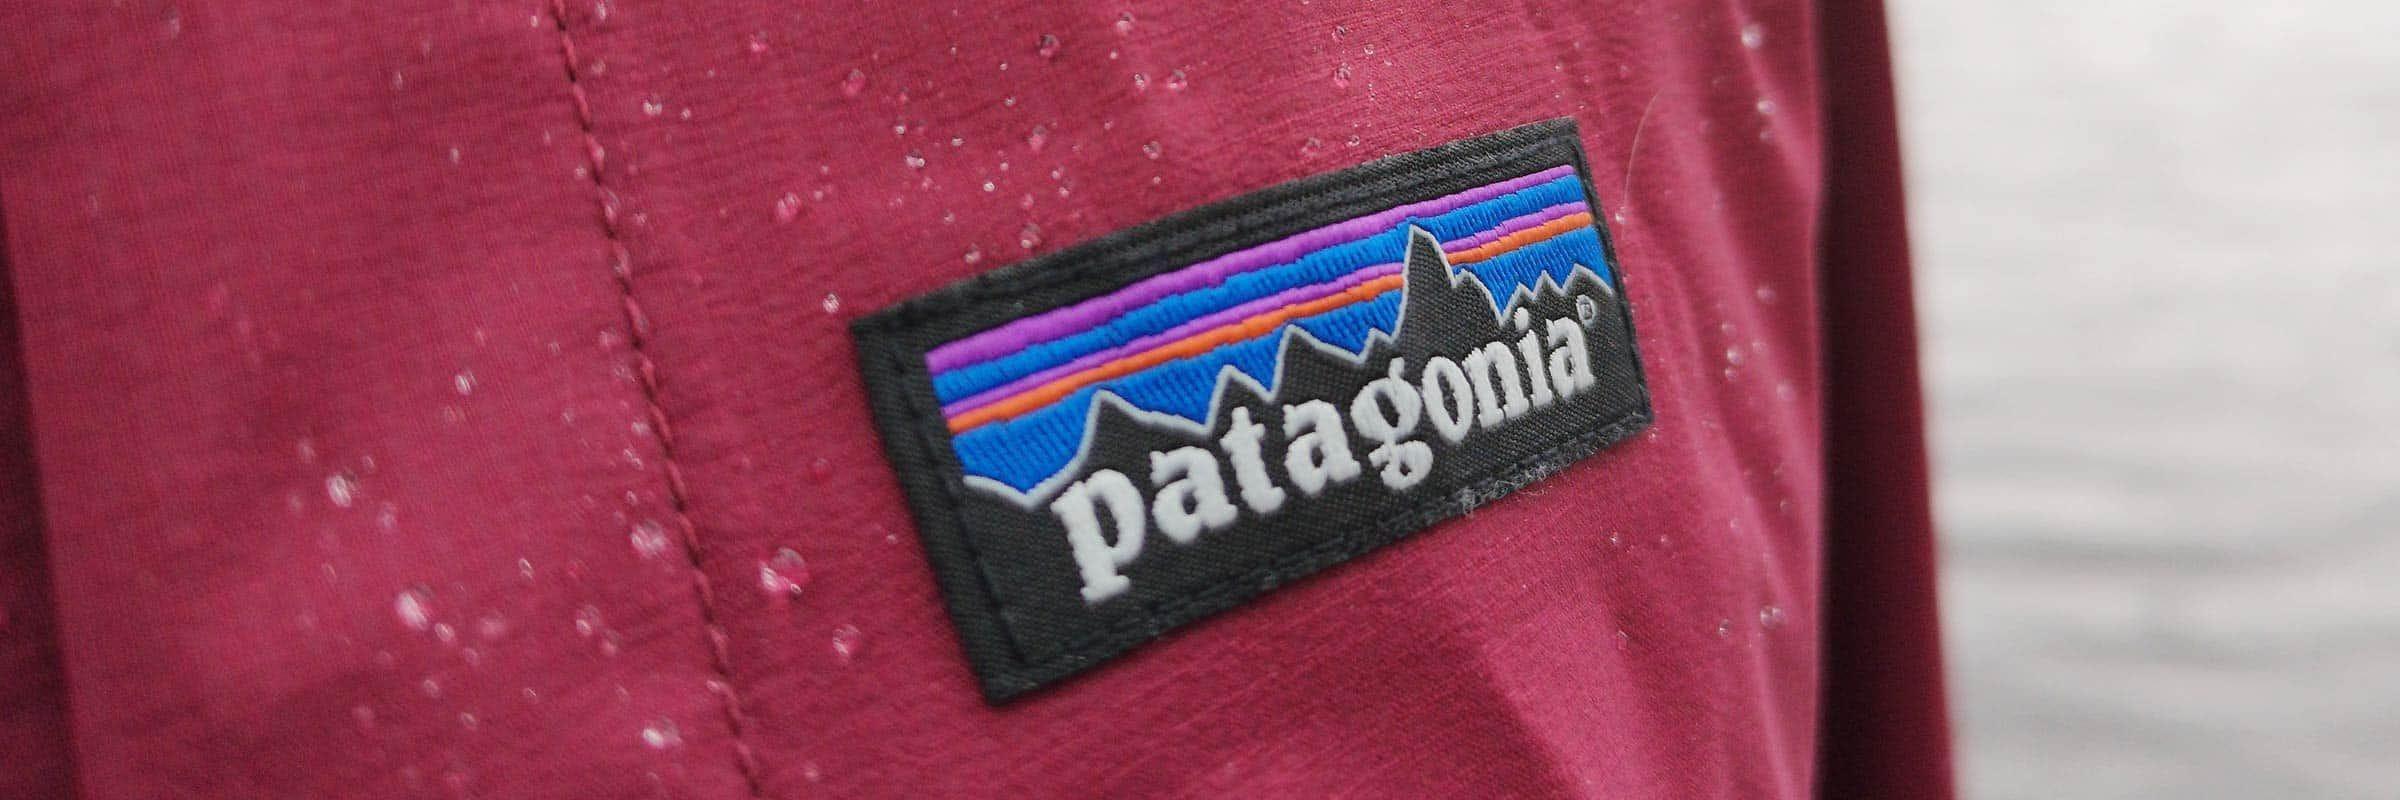 Revue du manteau Rainshadow de Patagonia